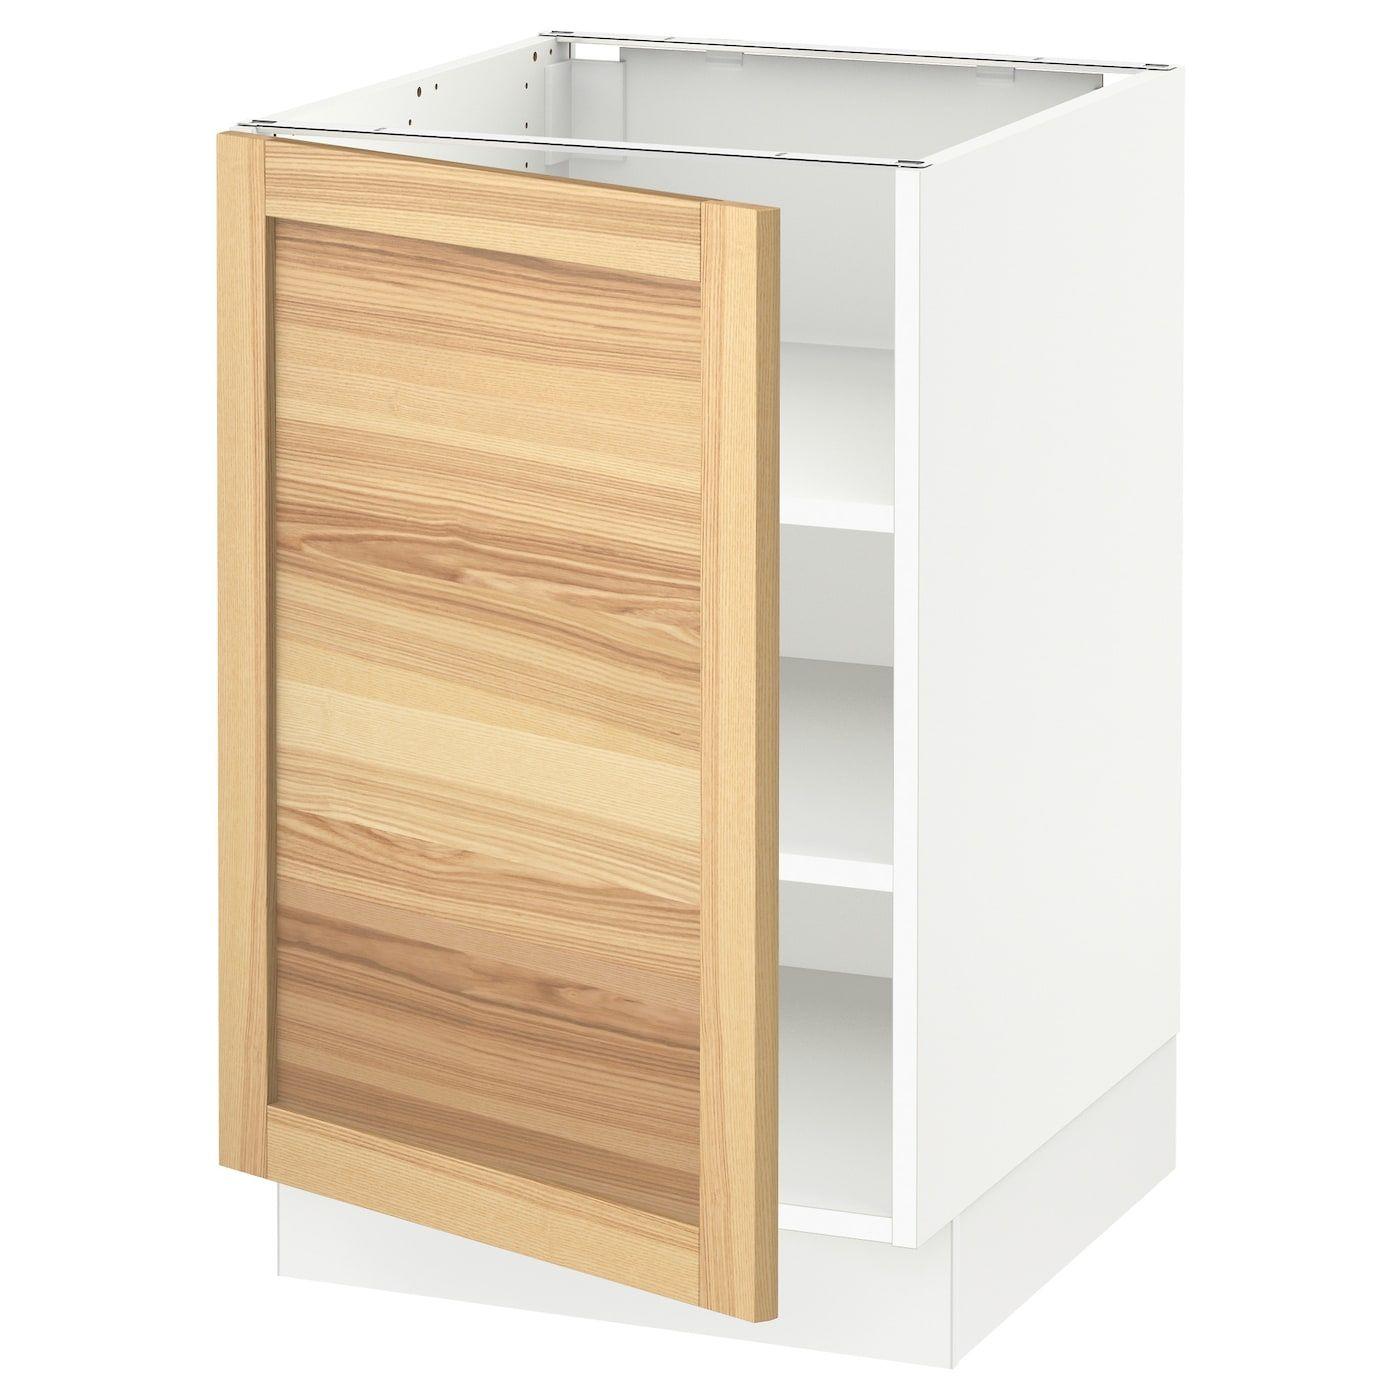 Ikea Sektion White Base Cabinet With Shelves Frame Colour White